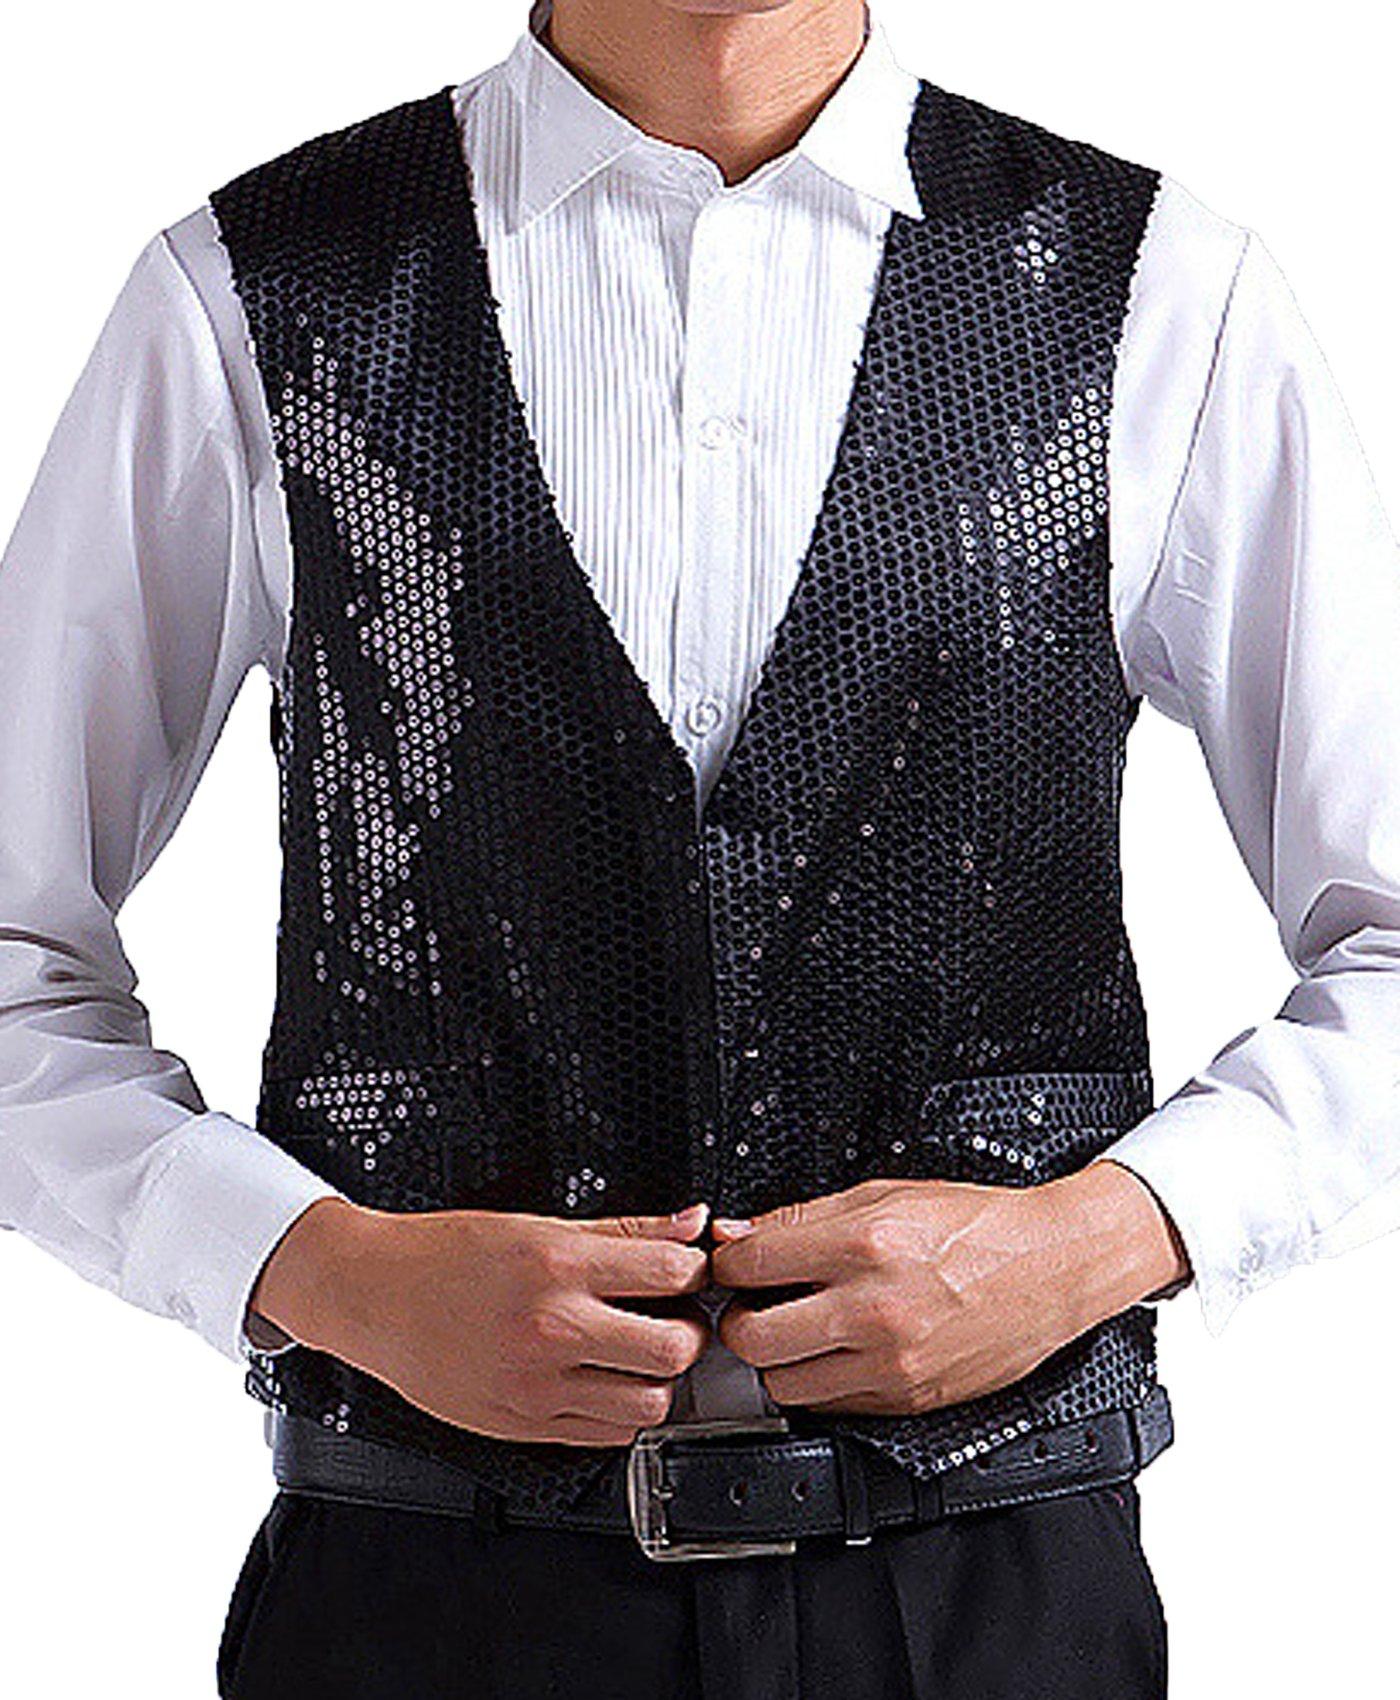 JOKHOO Men's Sequins Vest,Black,Small